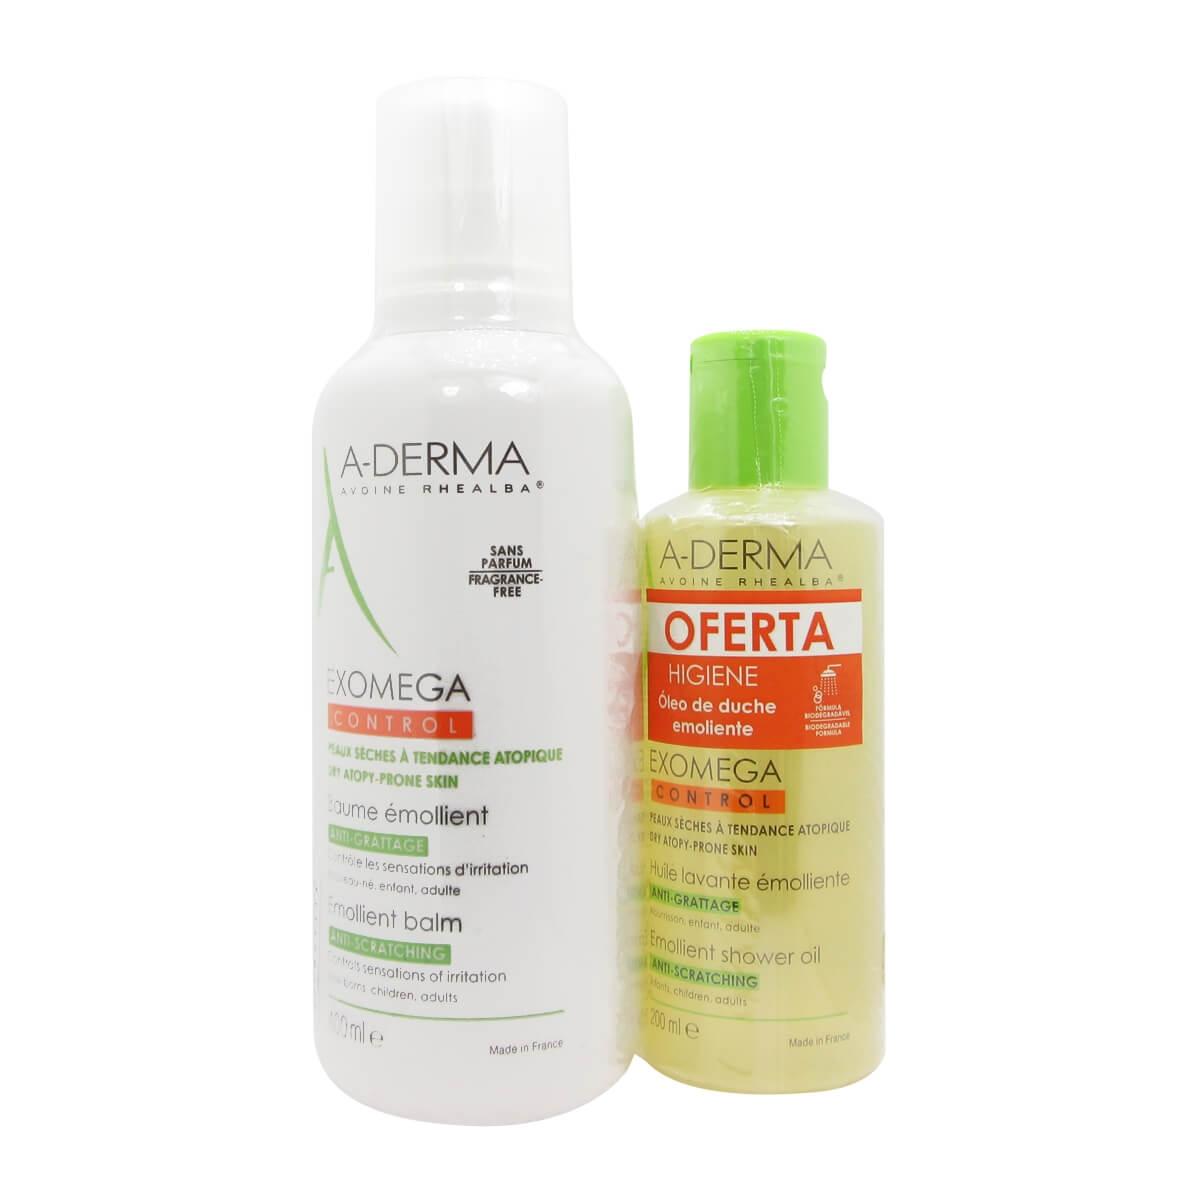 A-Derma Exomega Control Creme Emoliente 400ml+OFERTA  Oleo 200ml